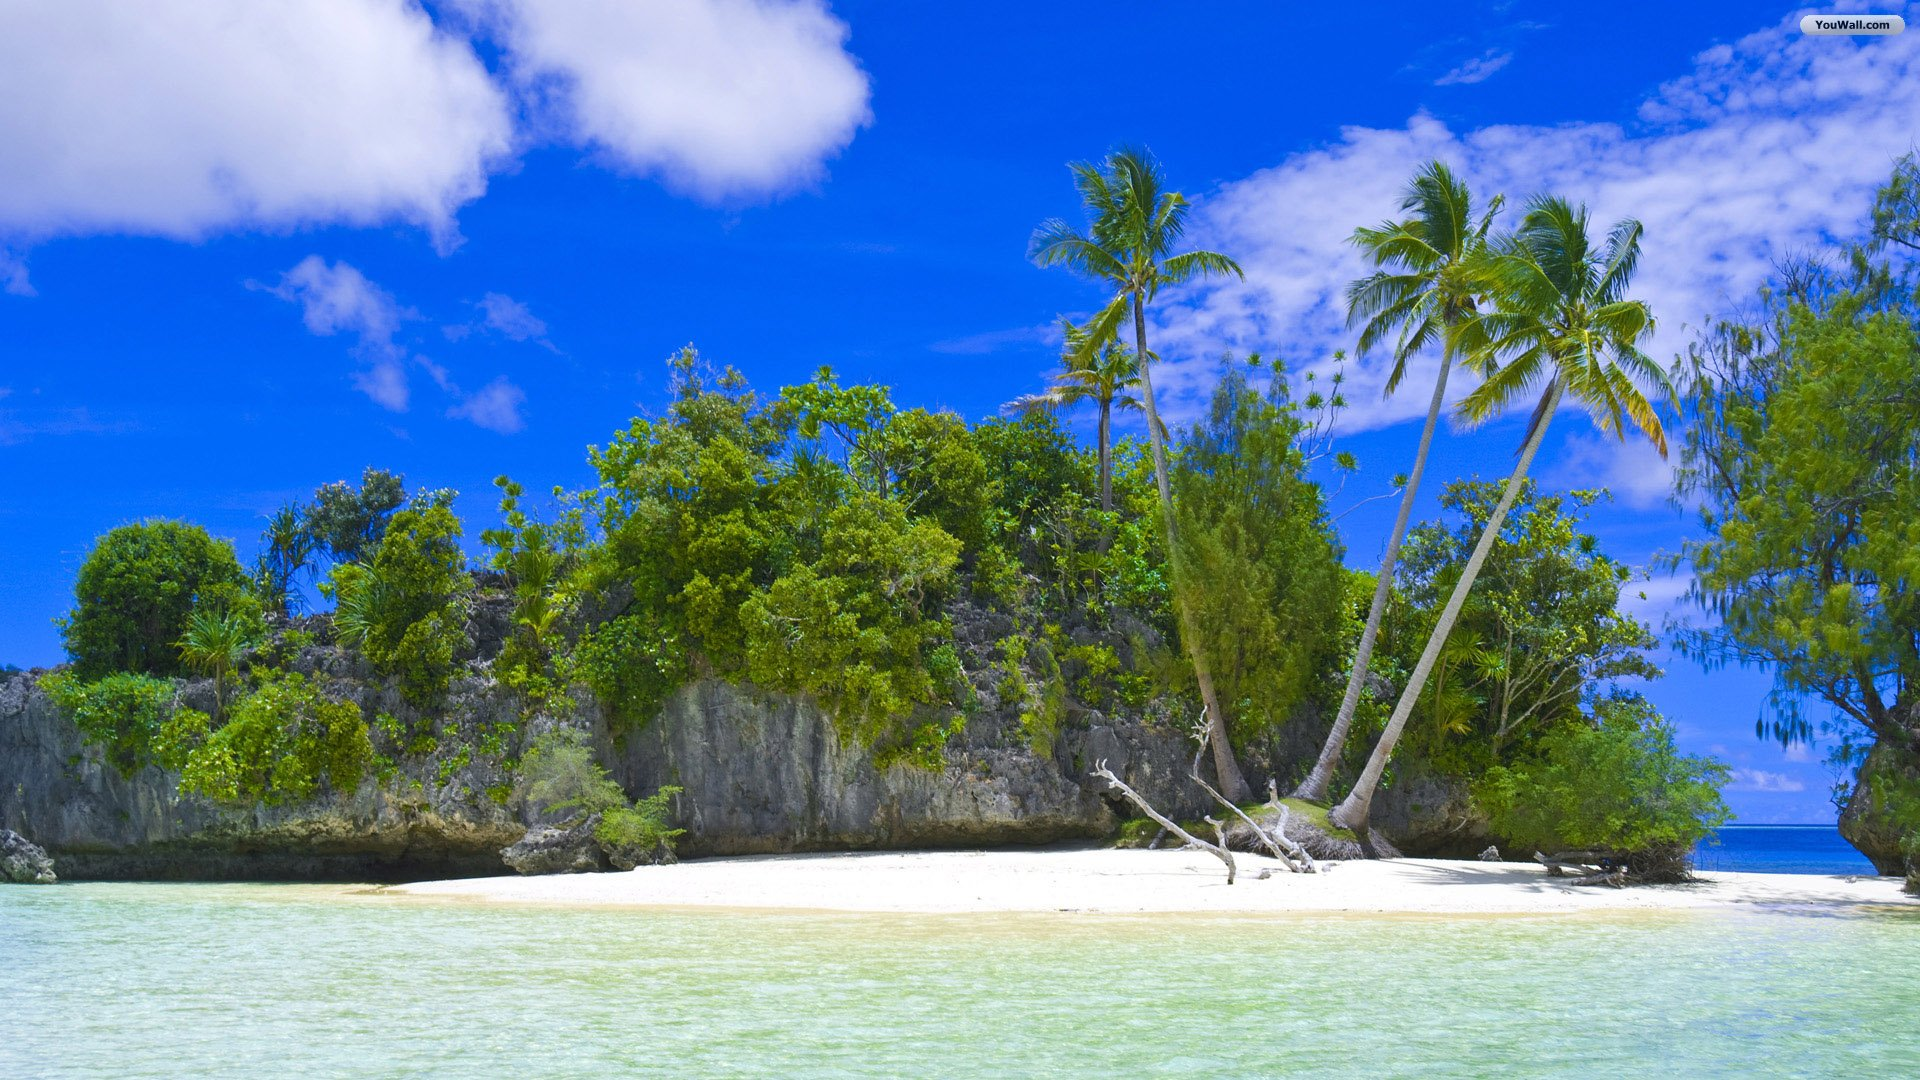 Island Wallpaper - wallpaper,wallpapers,free wallpaper,photo,desktop ...